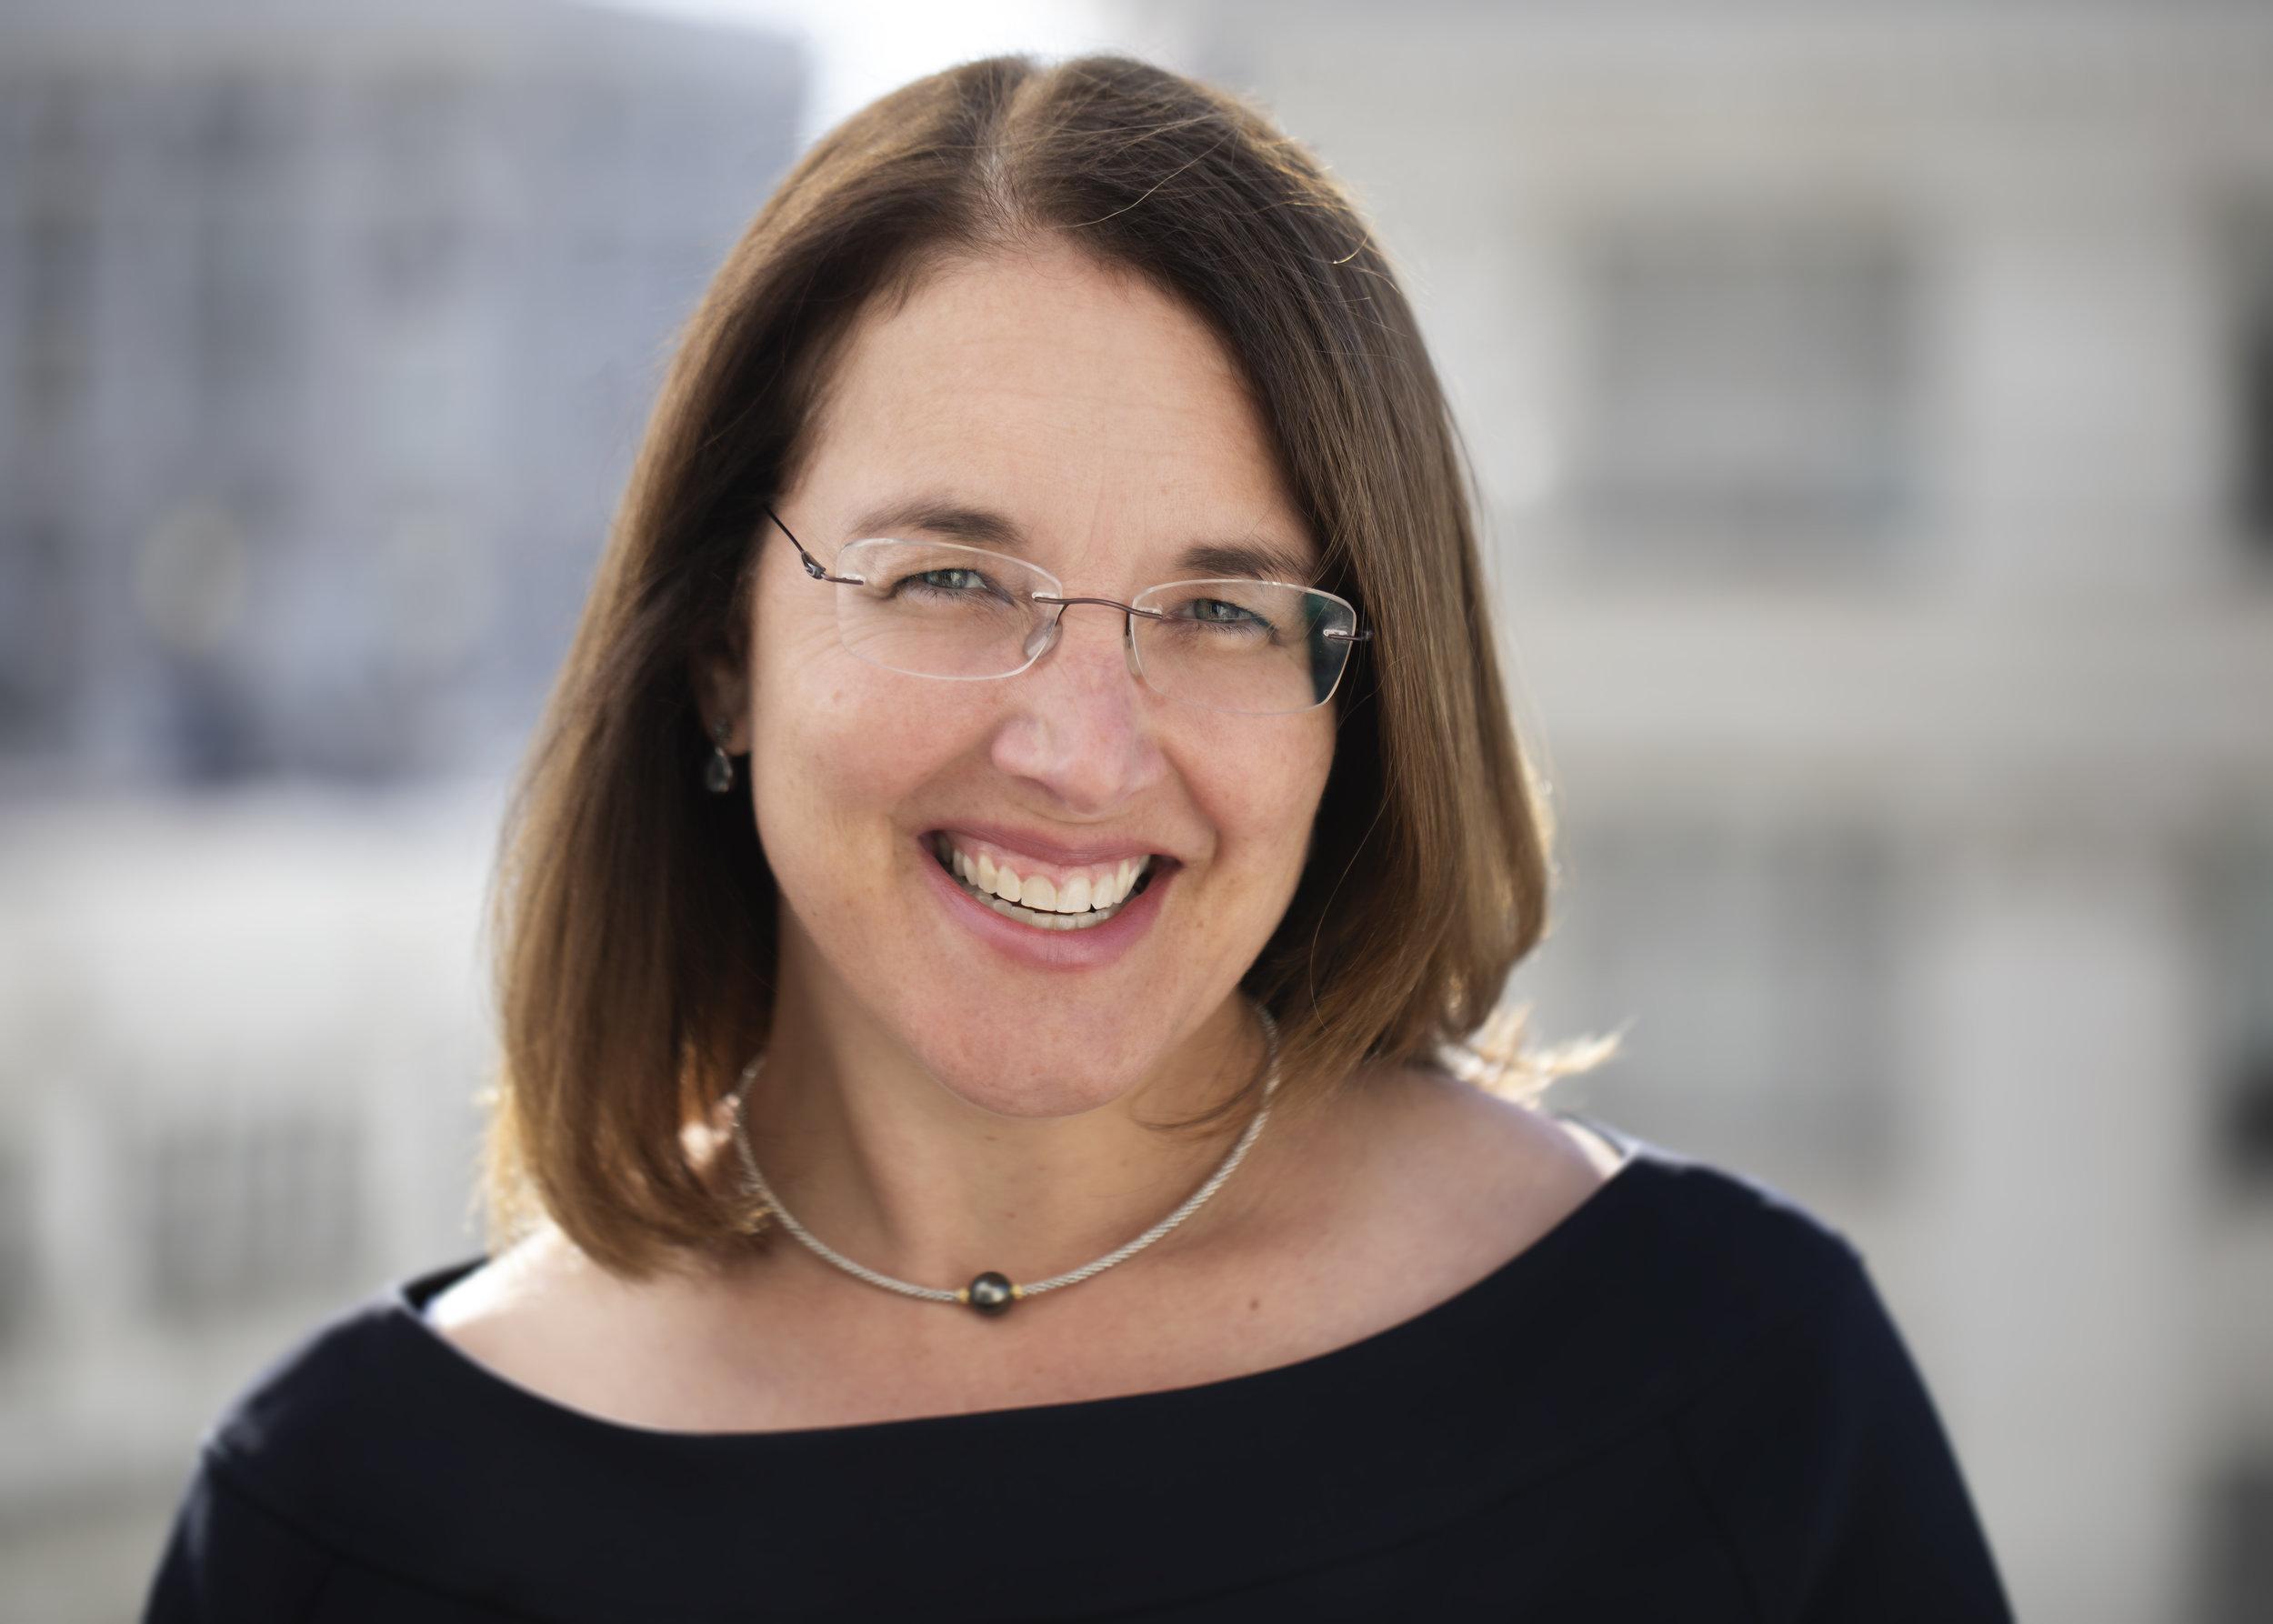 Barbara Adey joins Riffyn's board of directors